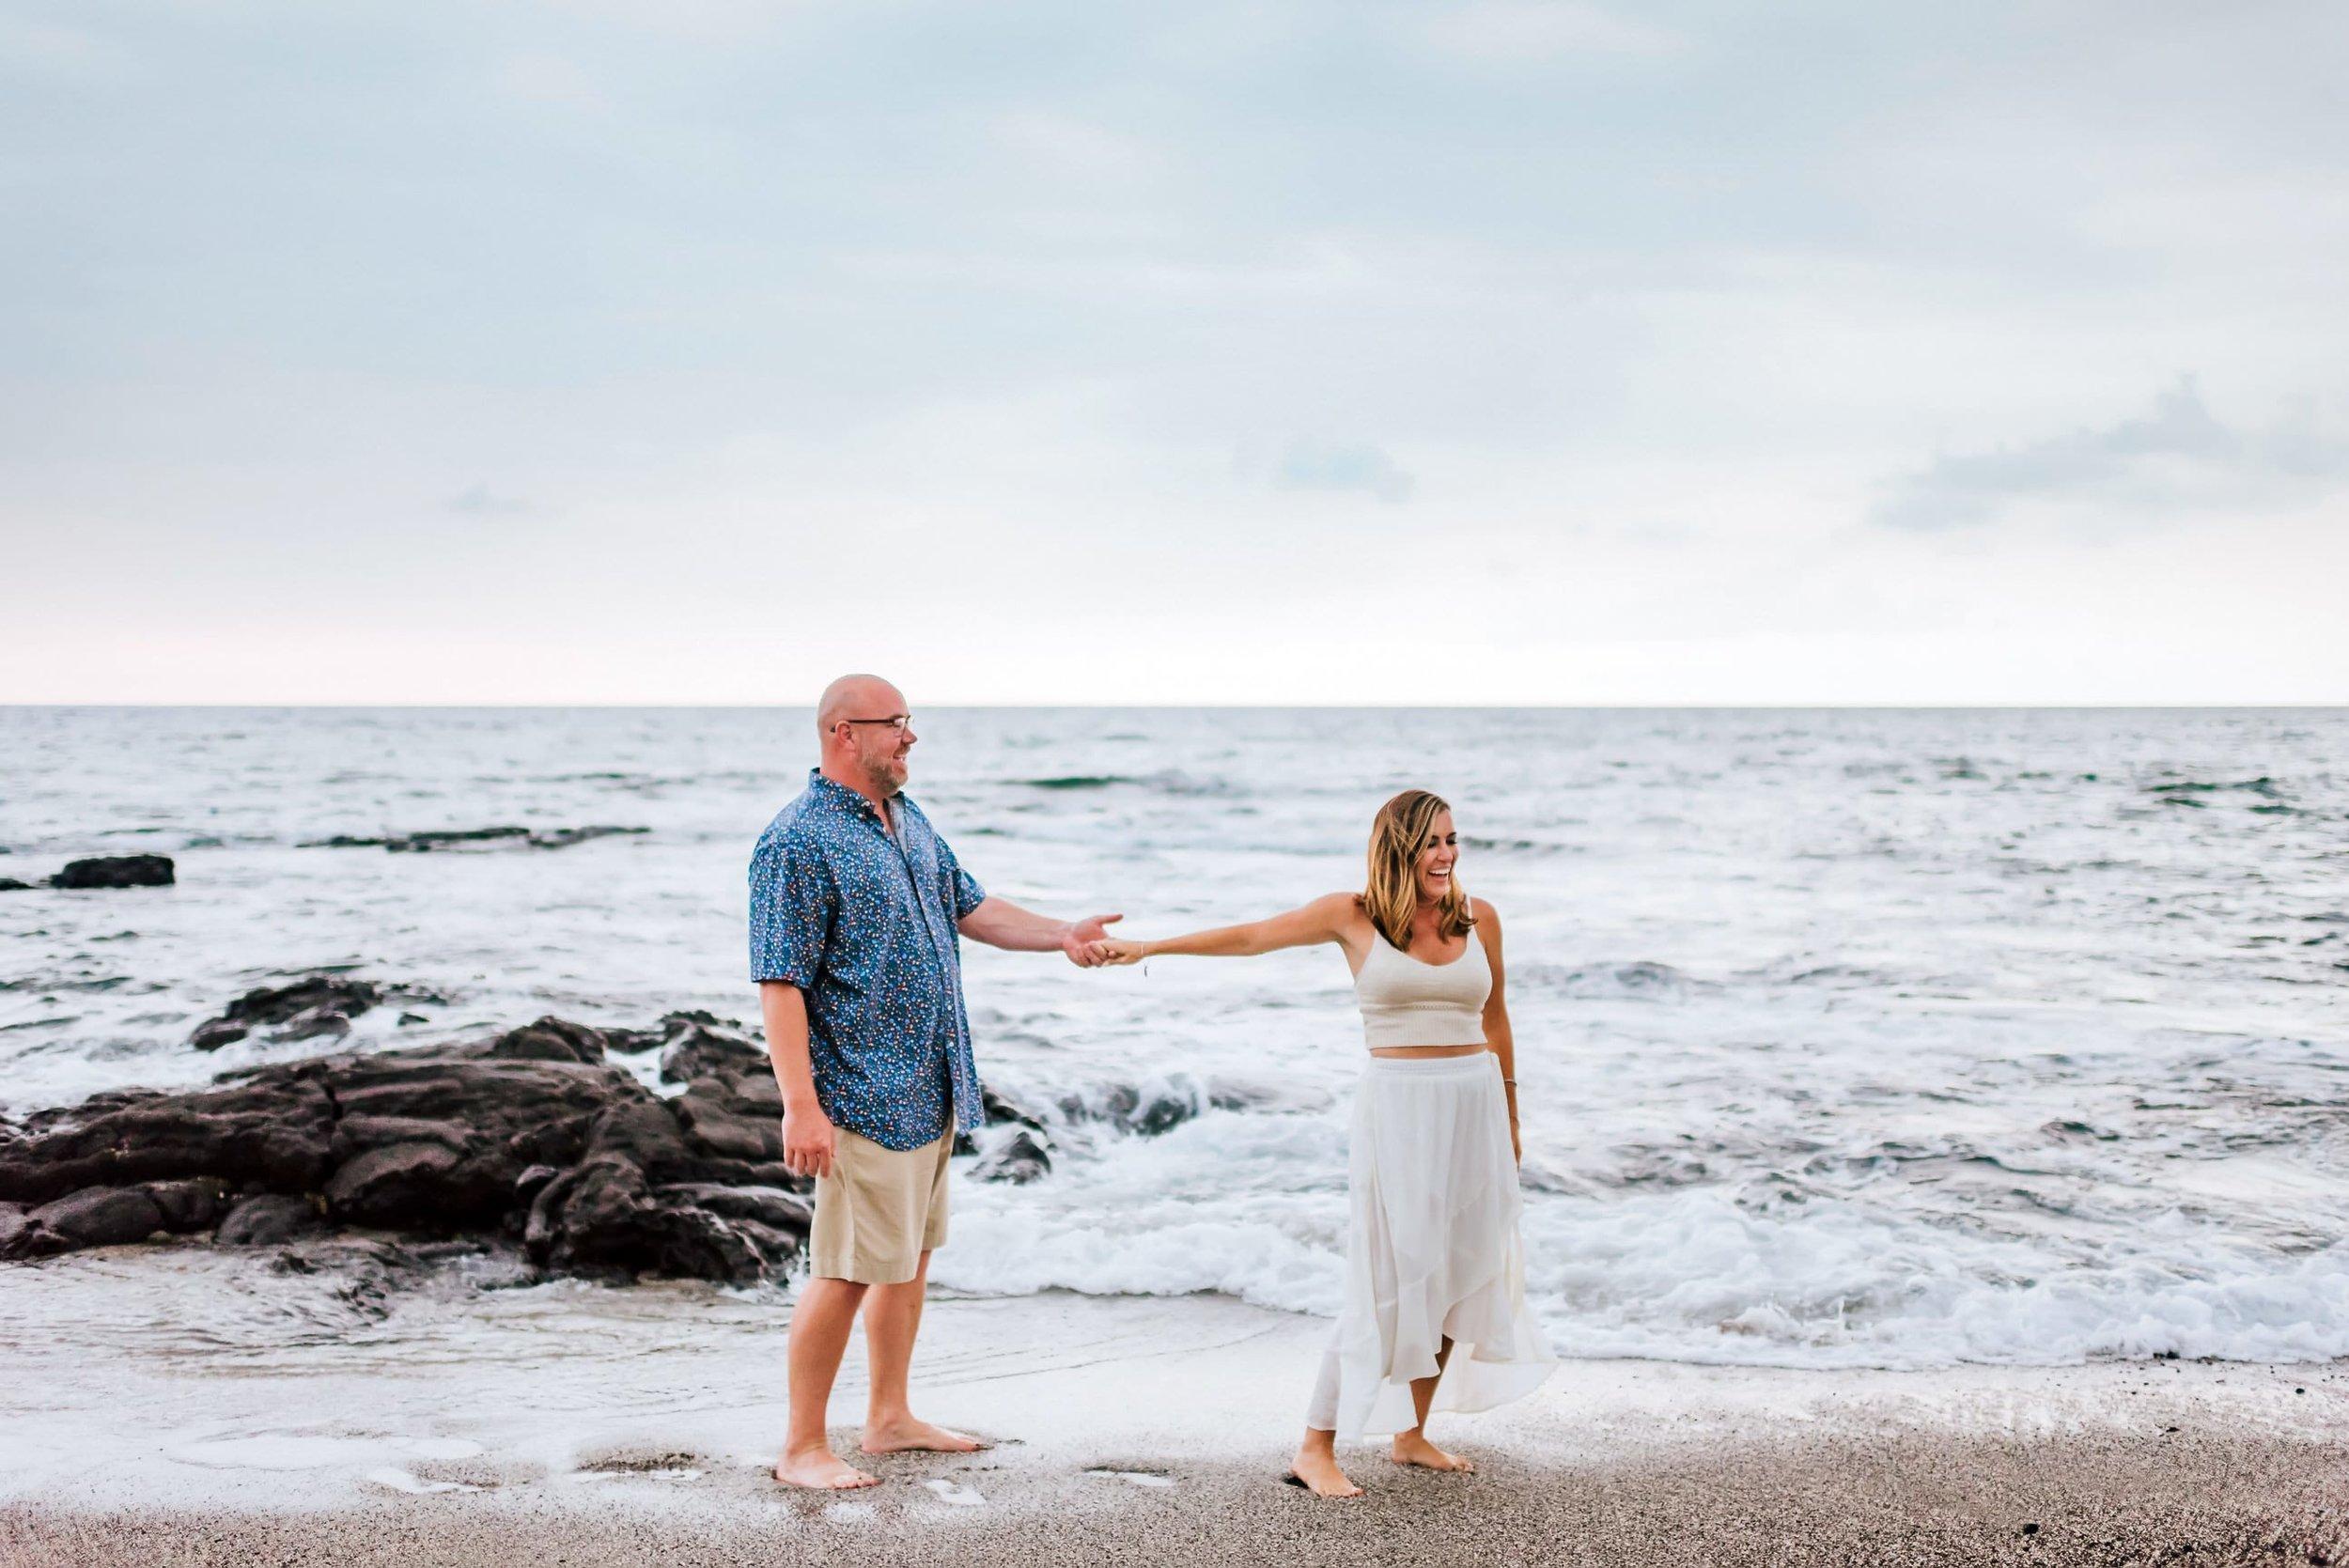 Waikoloa-Vacation-Family-Photographer-Big-Island-10.jpg